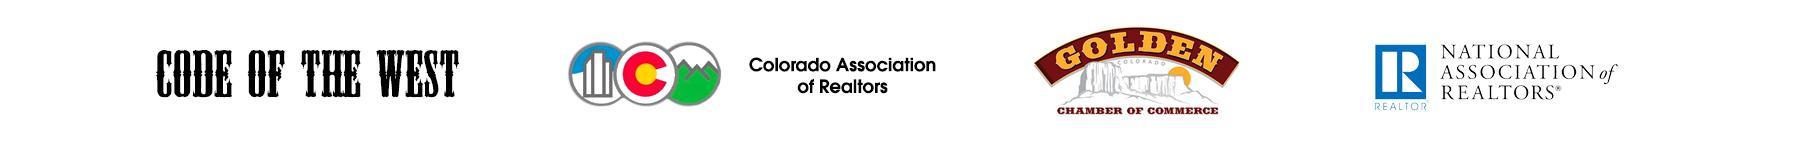 Golden Group Real Estate Advisors   Brian Quarnstrom and Debbie Johnson